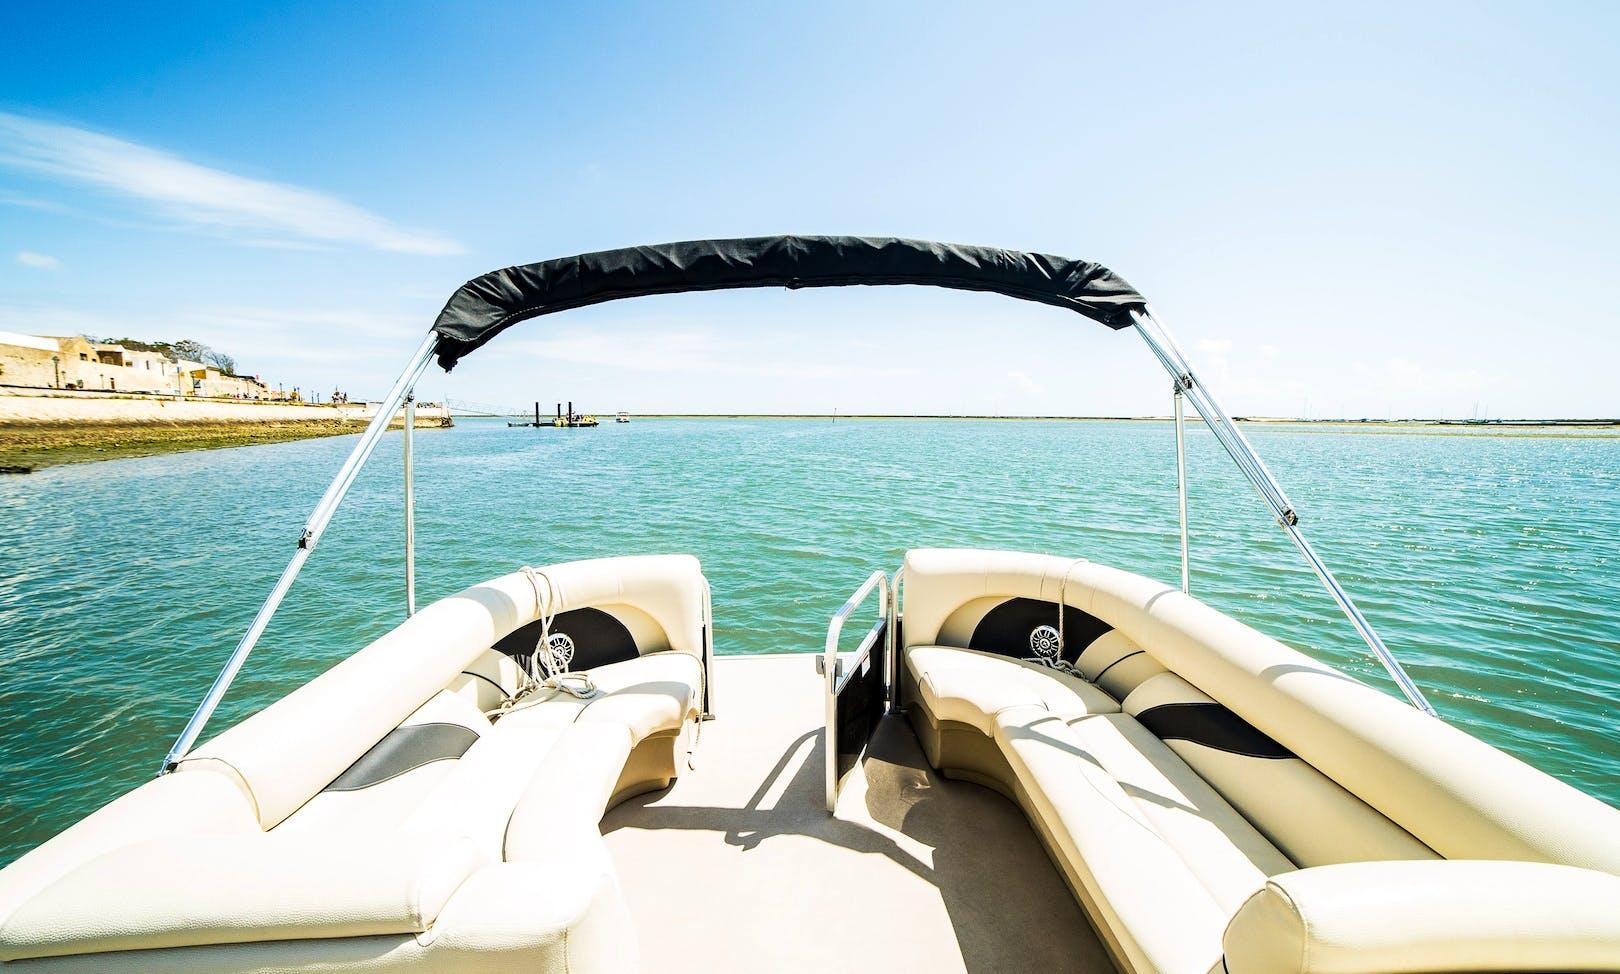 Pontoon Boat Rental in Ria Formosa, Faro, Algarve Portugal